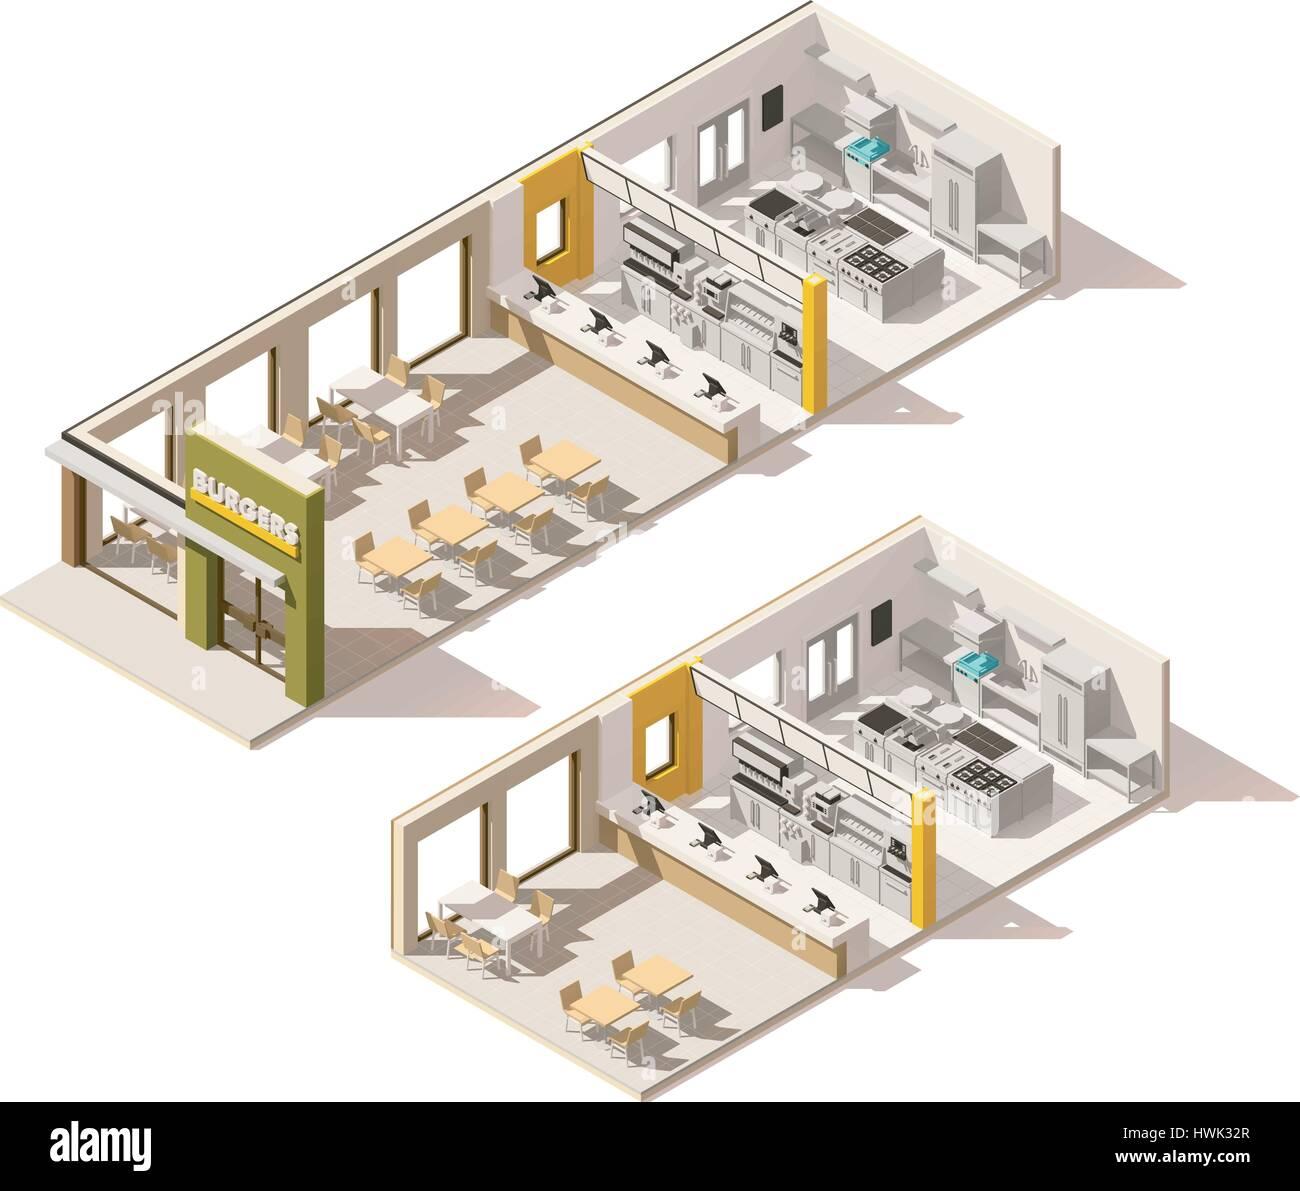 vector isometric low poly fast food restaurant stock vector art illustration vector image. Black Bedroom Furniture Sets. Home Design Ideas